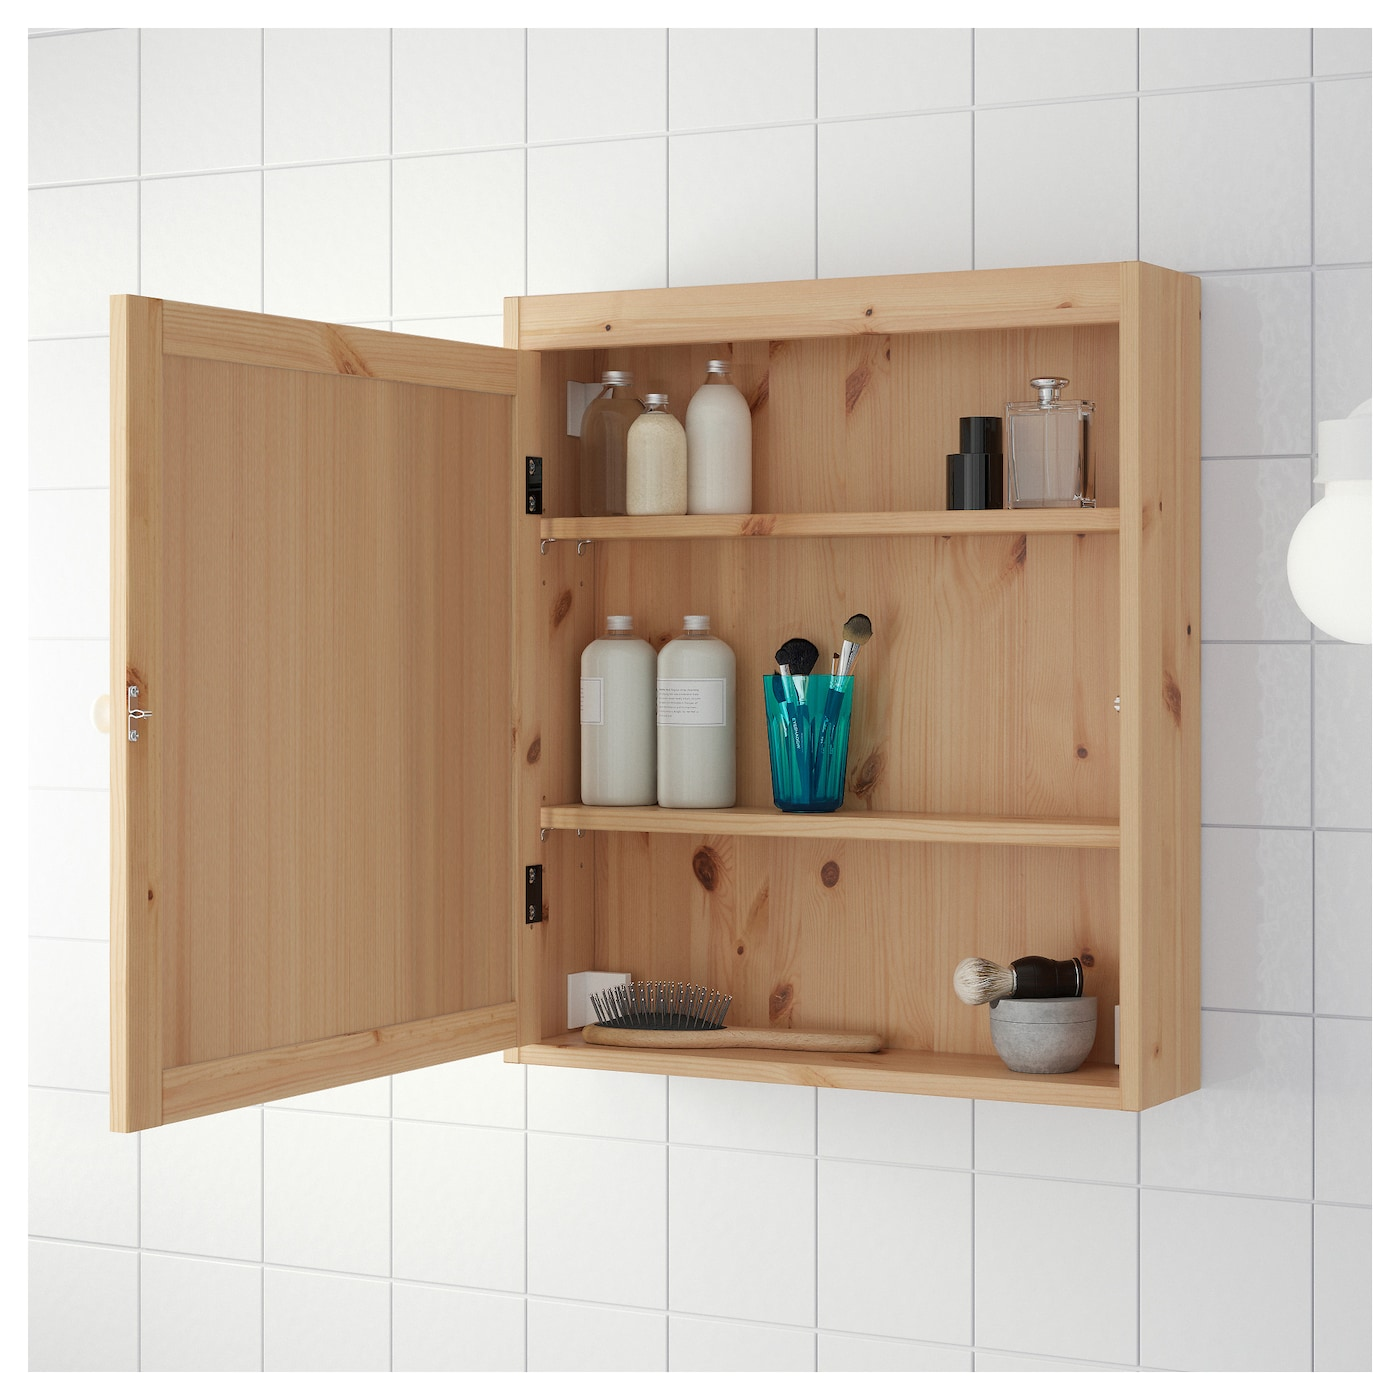 Silver N Meuble Avec Miroir Brun Clair 60x14x68 Cm Ikea # Meuble La Porte